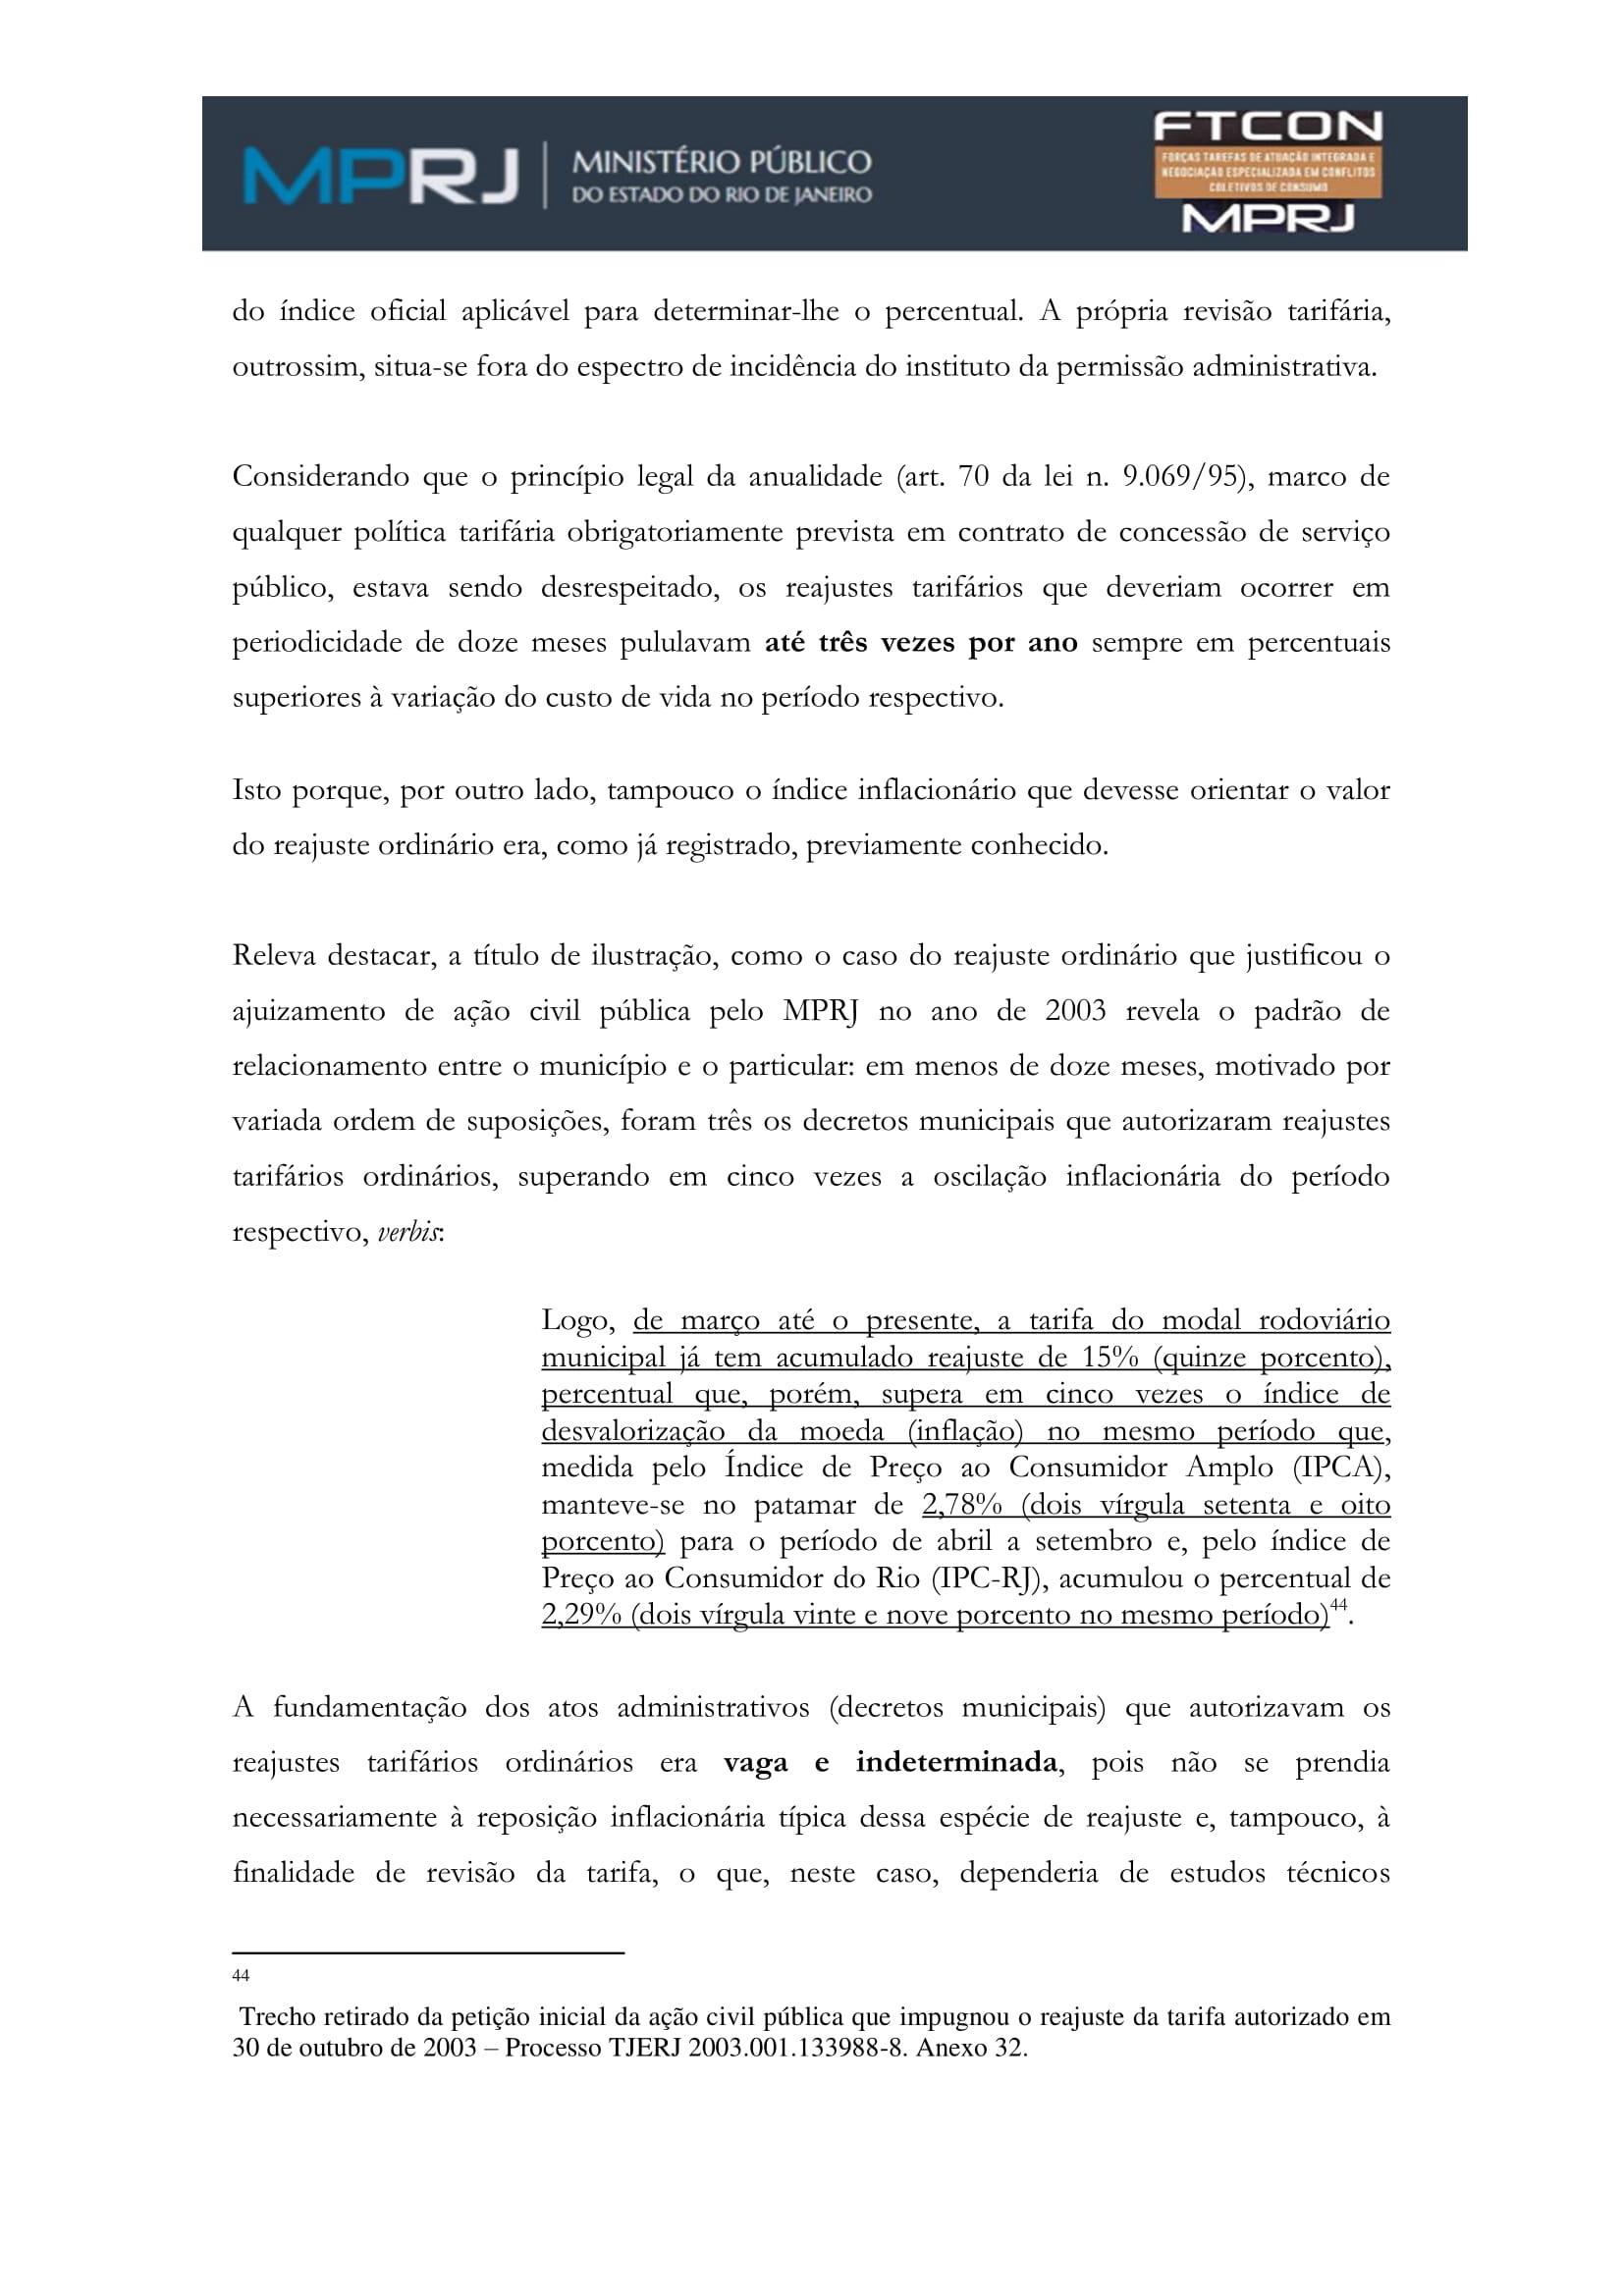 acp_caducidade_onibus_dr_rt-059